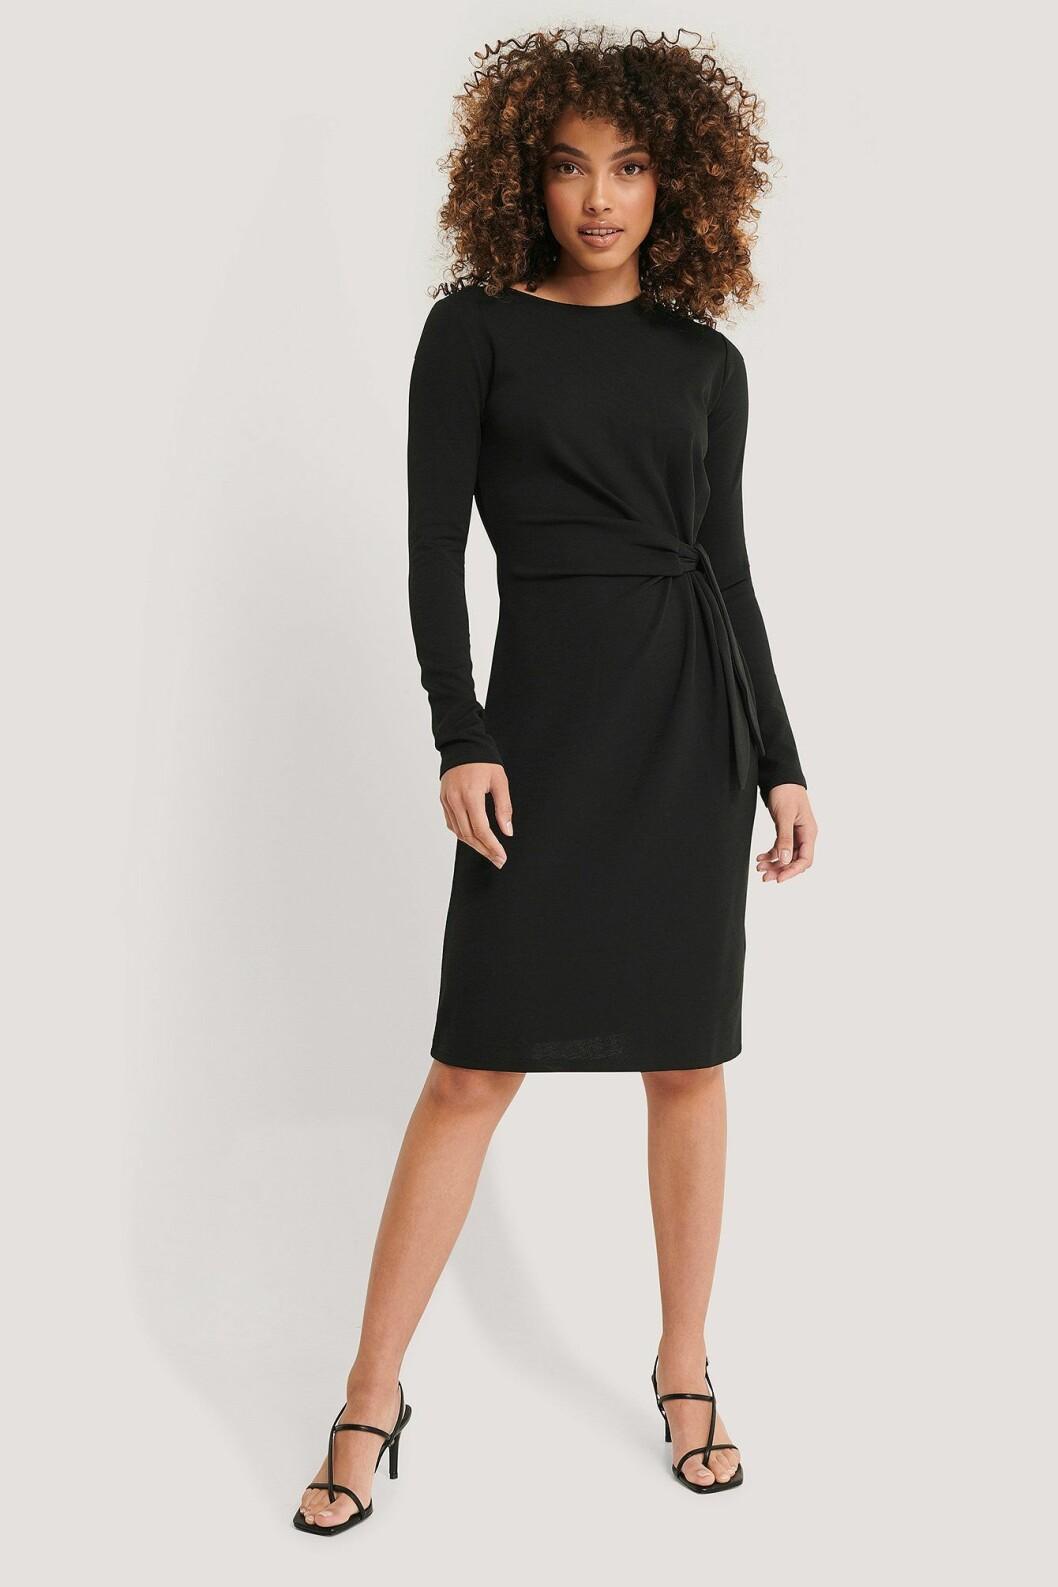 Imane Asry x Na-kd: Svart klänning